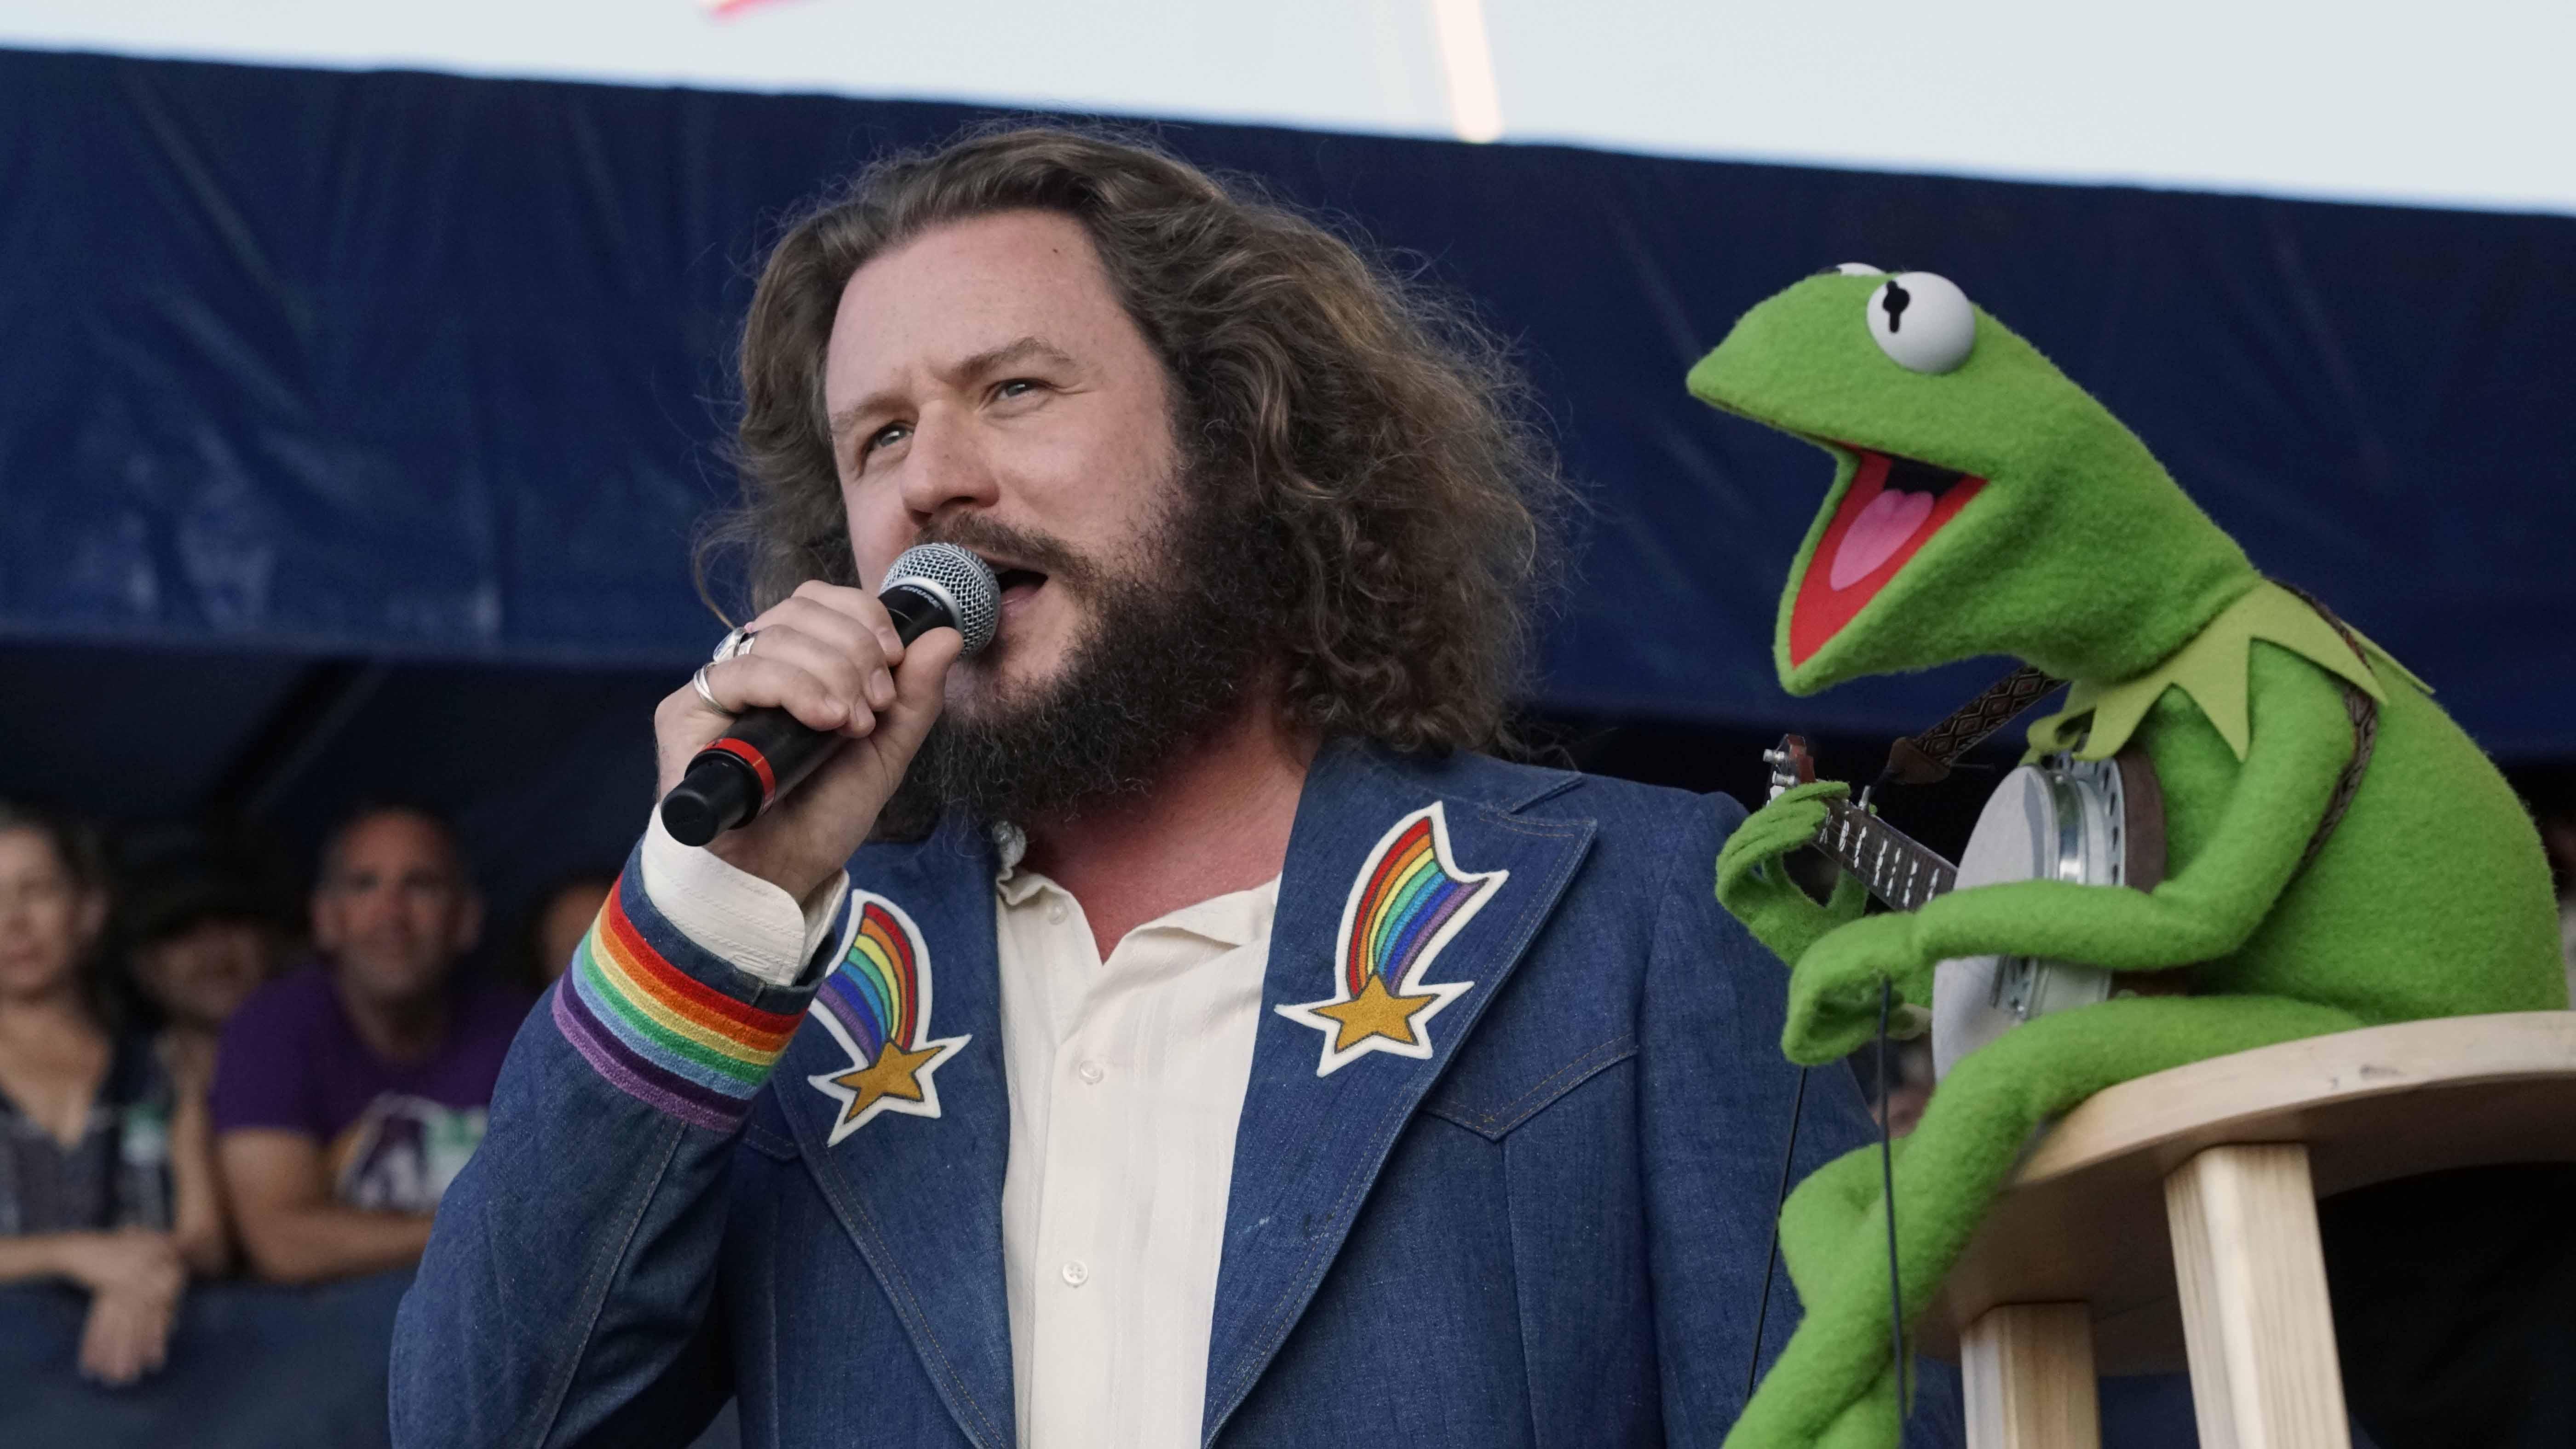 Newport Folk Festival Day 3: Kermit the Frog, Bonny Light Horseman, J.S. Ondara, Phosphorescent Make For A Grand Sunday (FESTIVAL RECAP/PHOTOS)